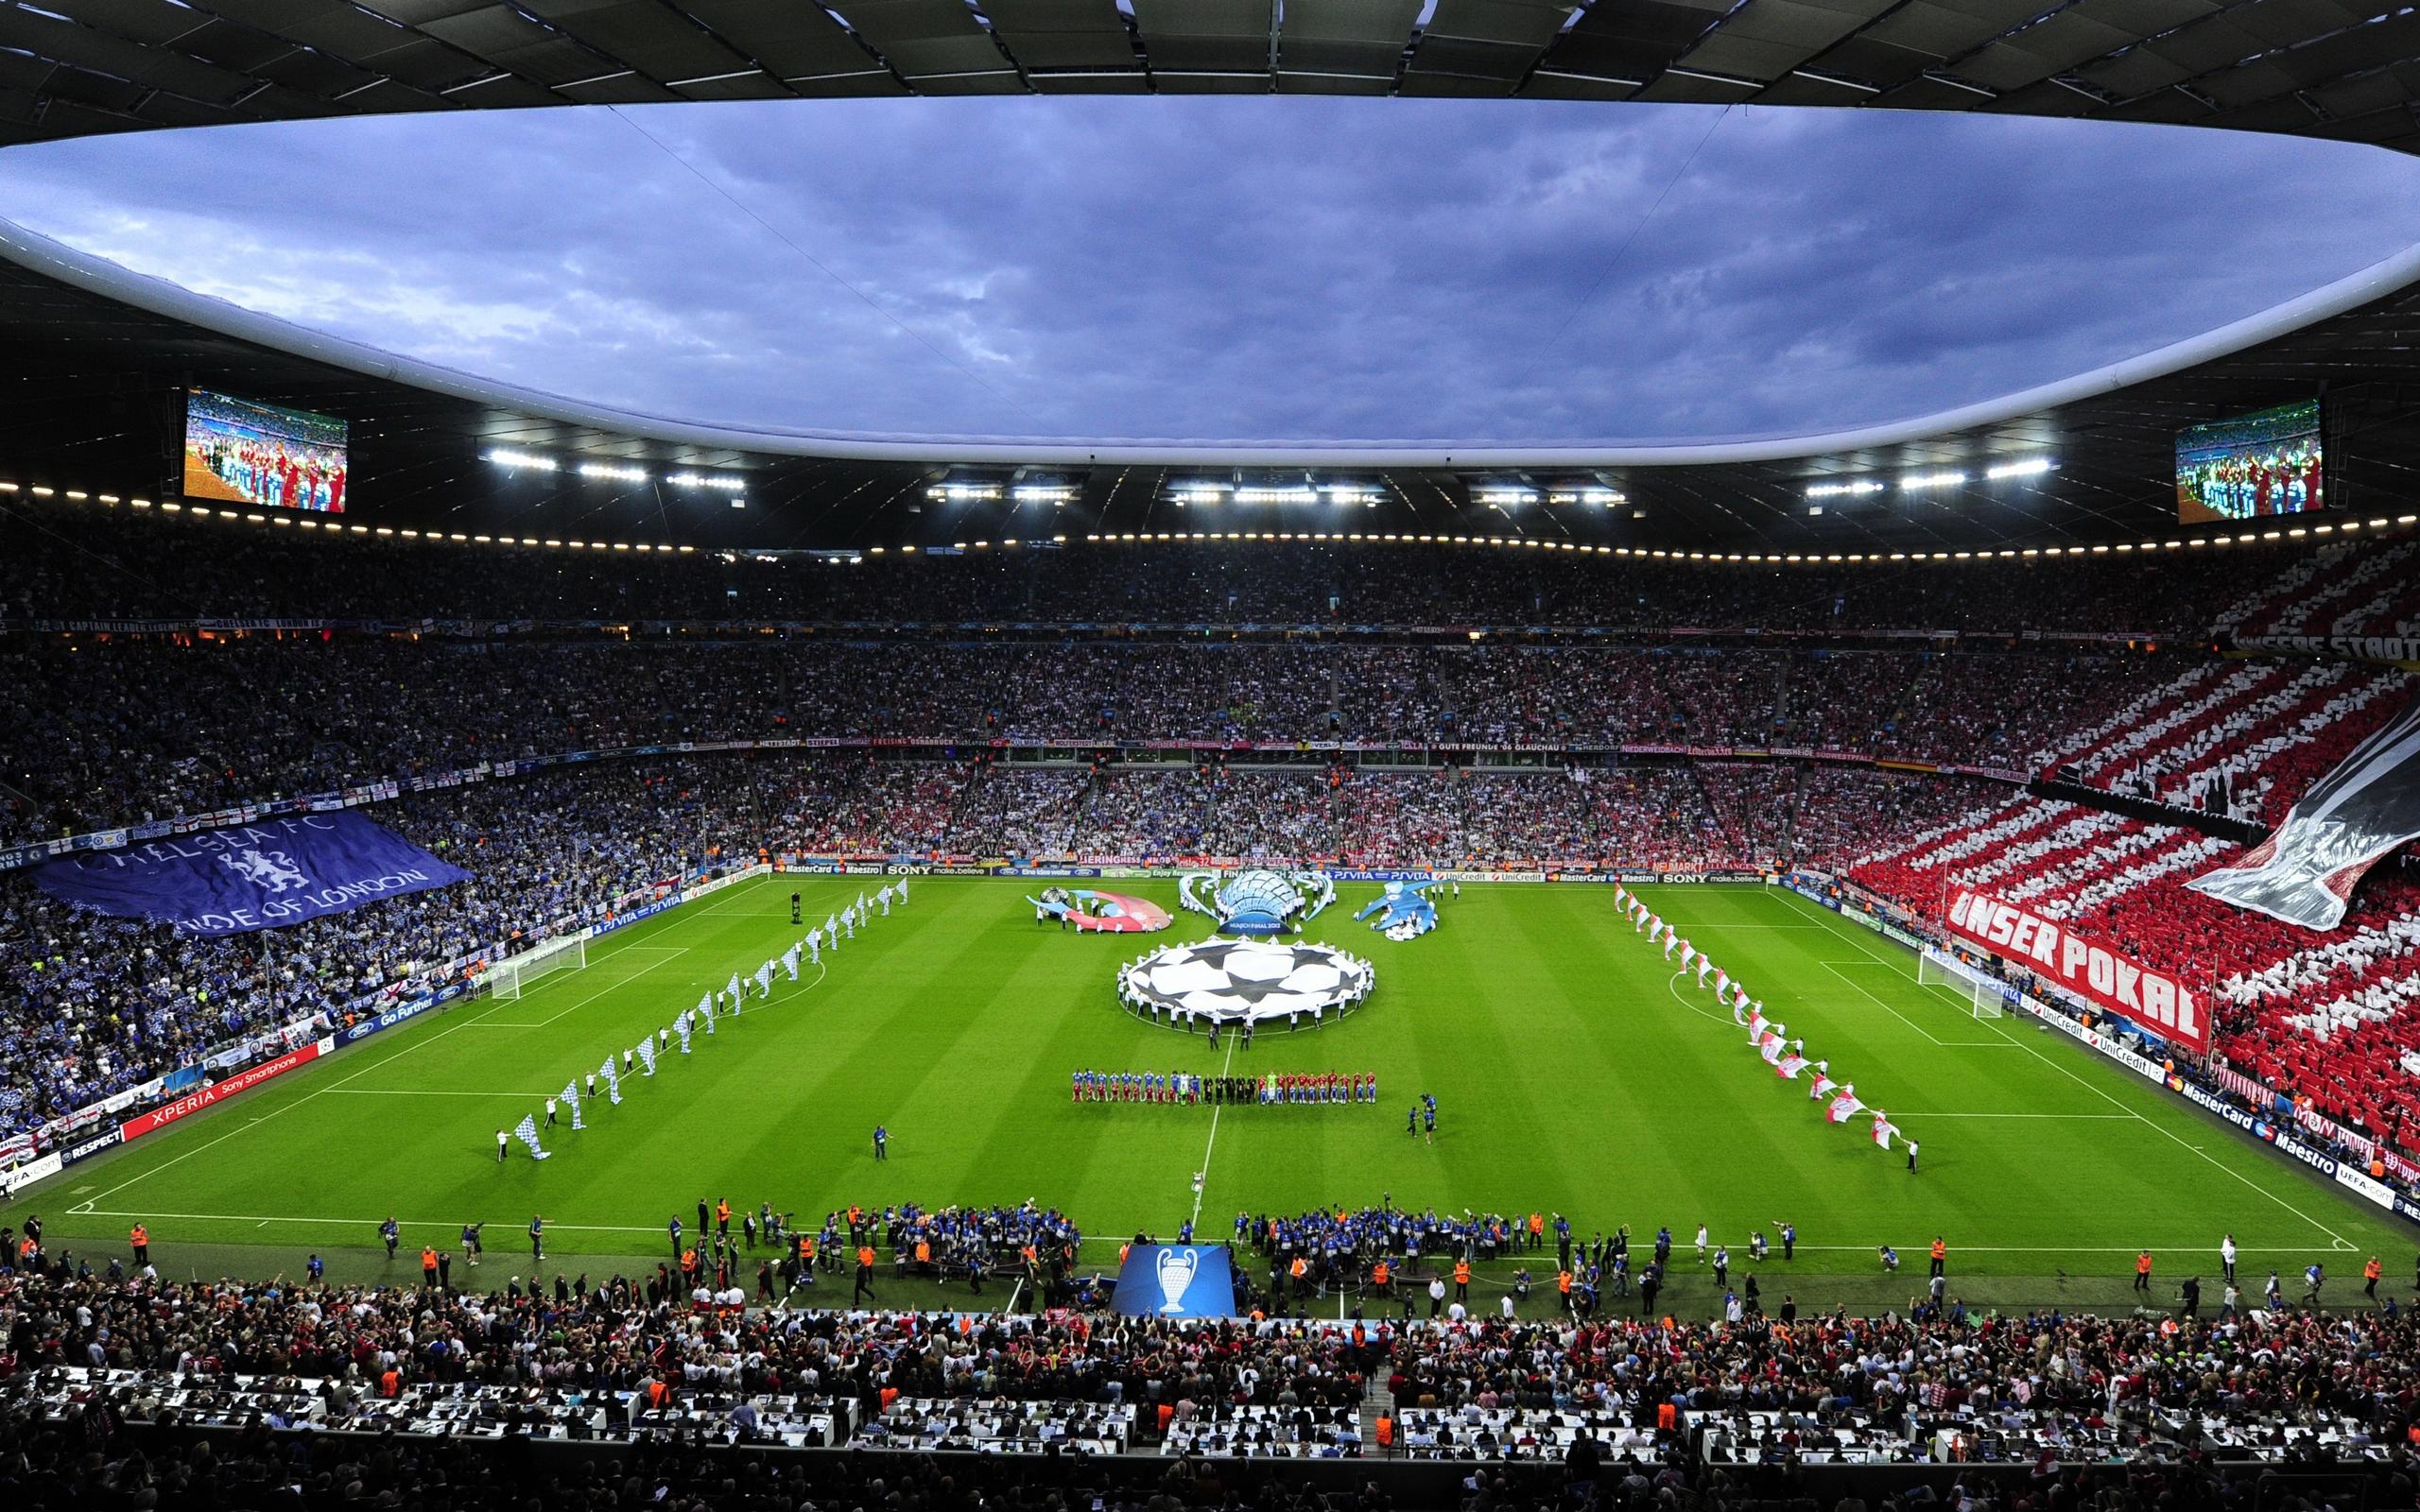 футбол, стадион, трибуны